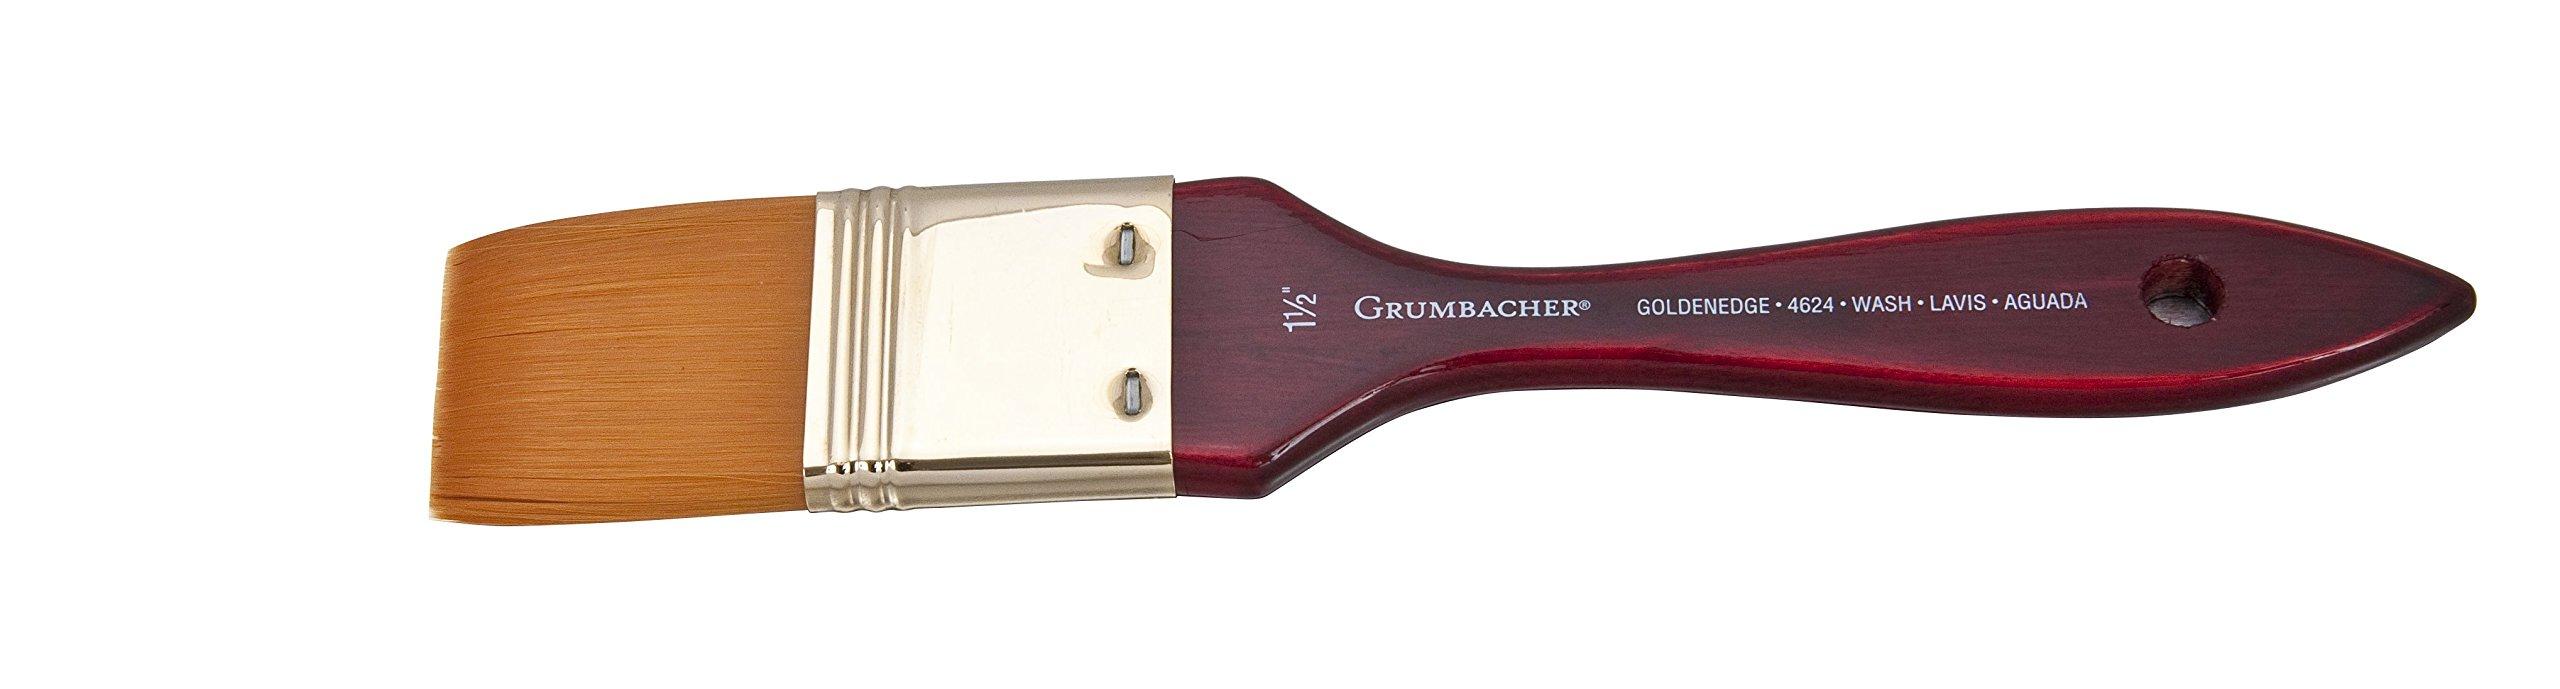 Grumbacher Goldenedge Golden Toray Wash Watercolor Brush, Synthetic Bristles, Size 1-1/2'' (4624.150)